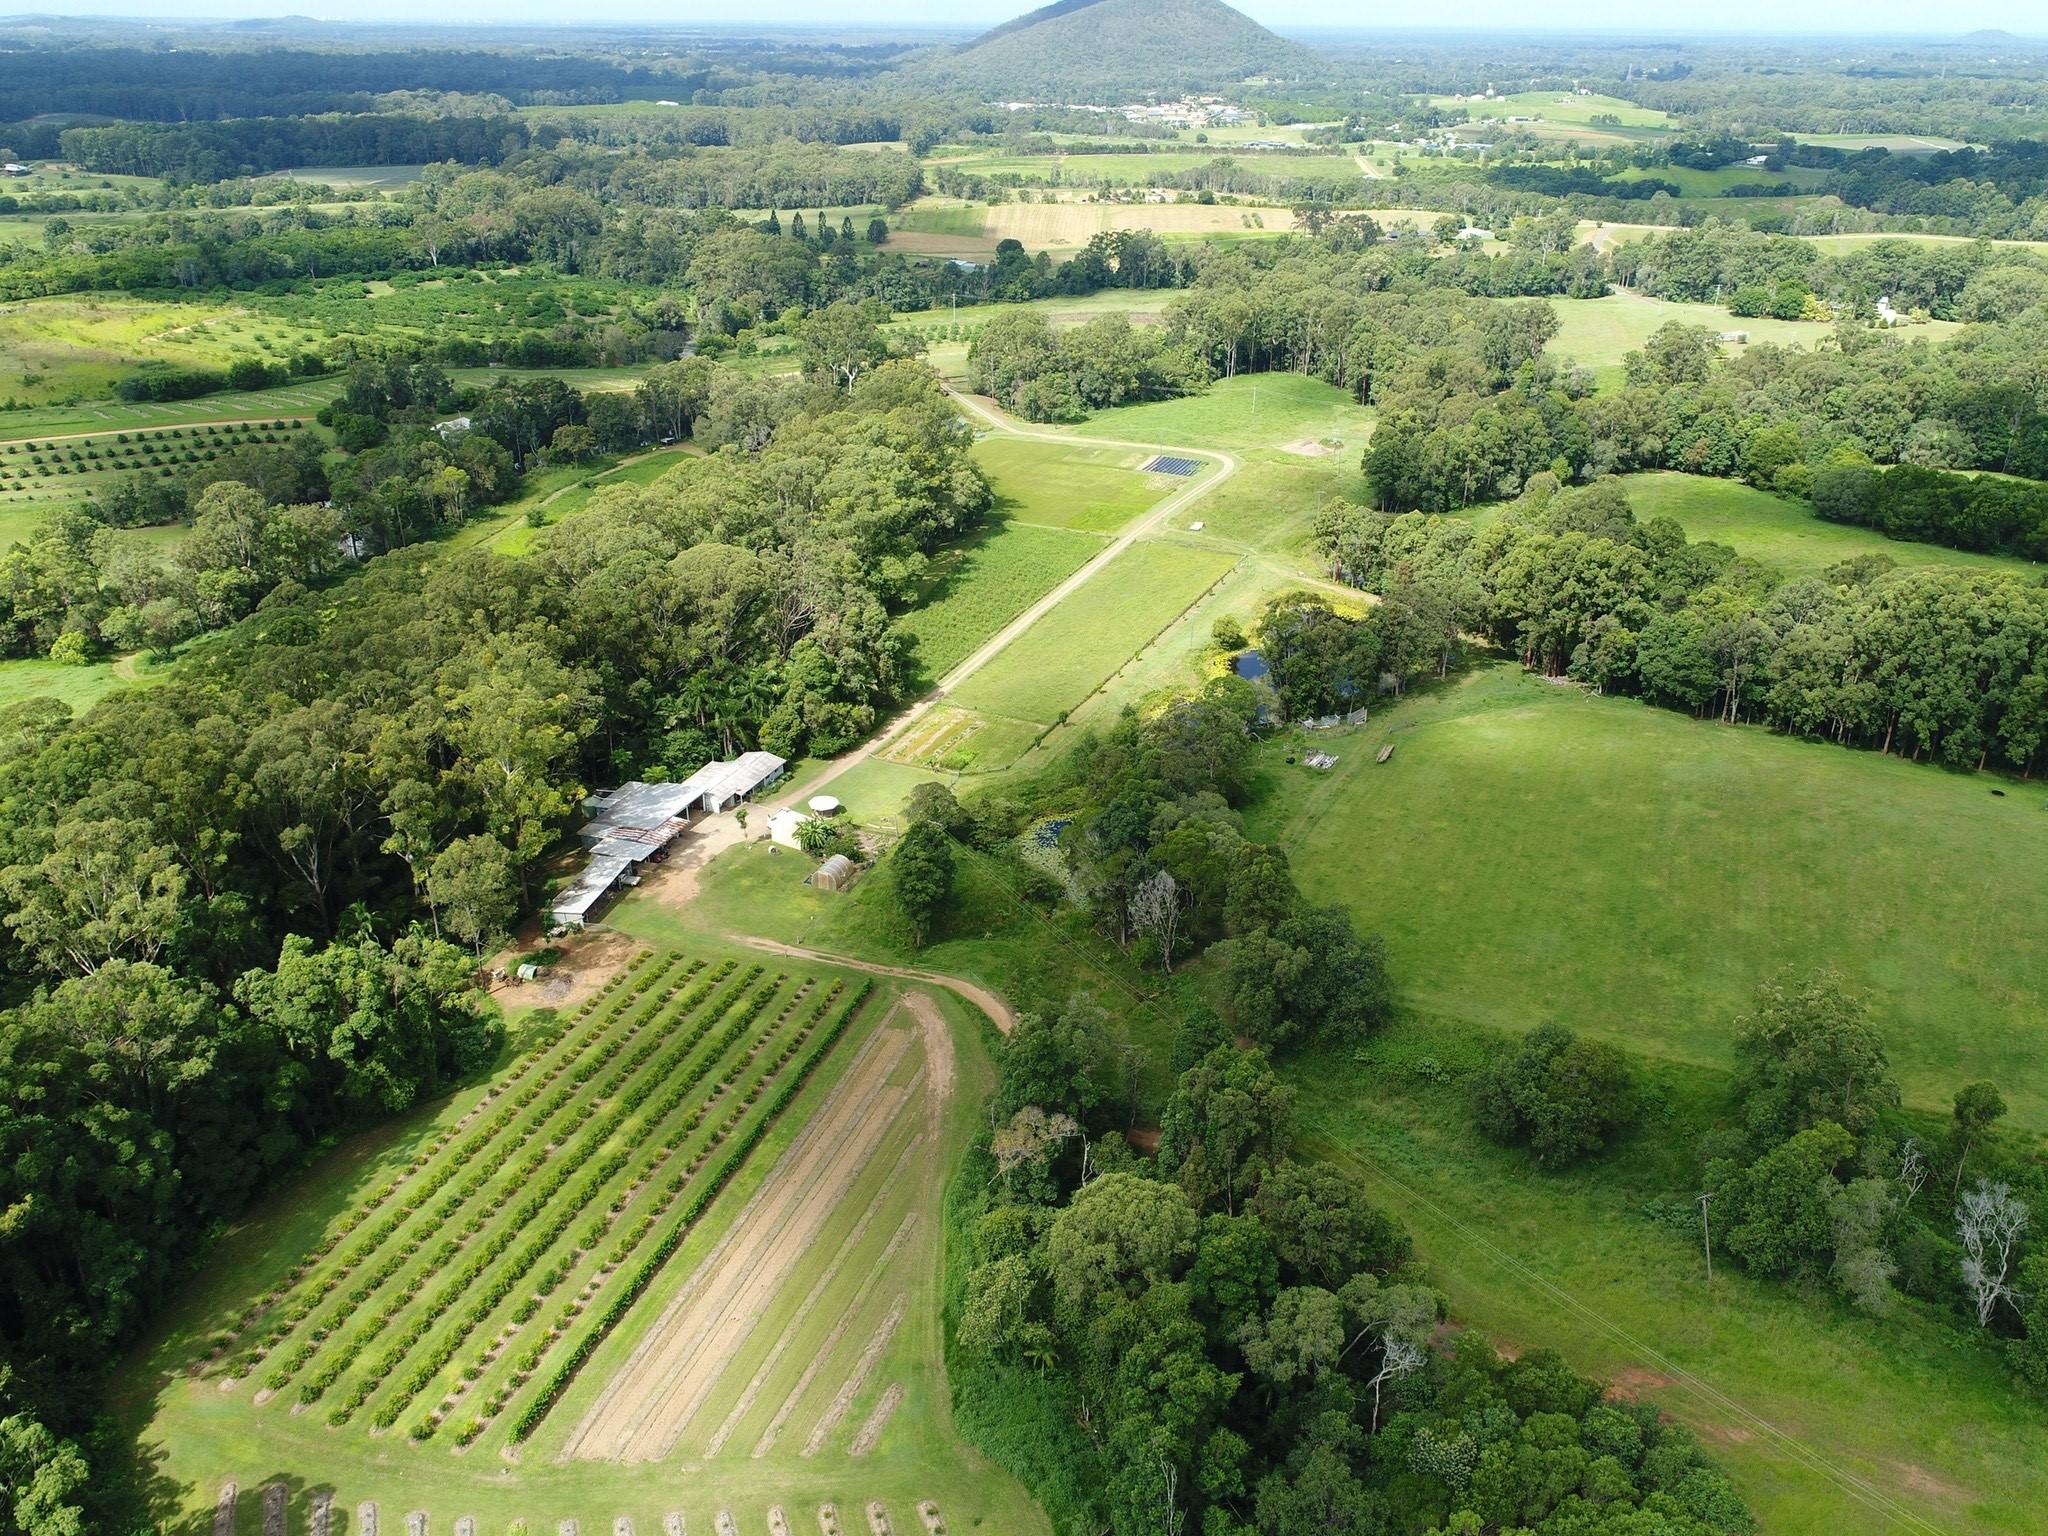 Jade King's farm